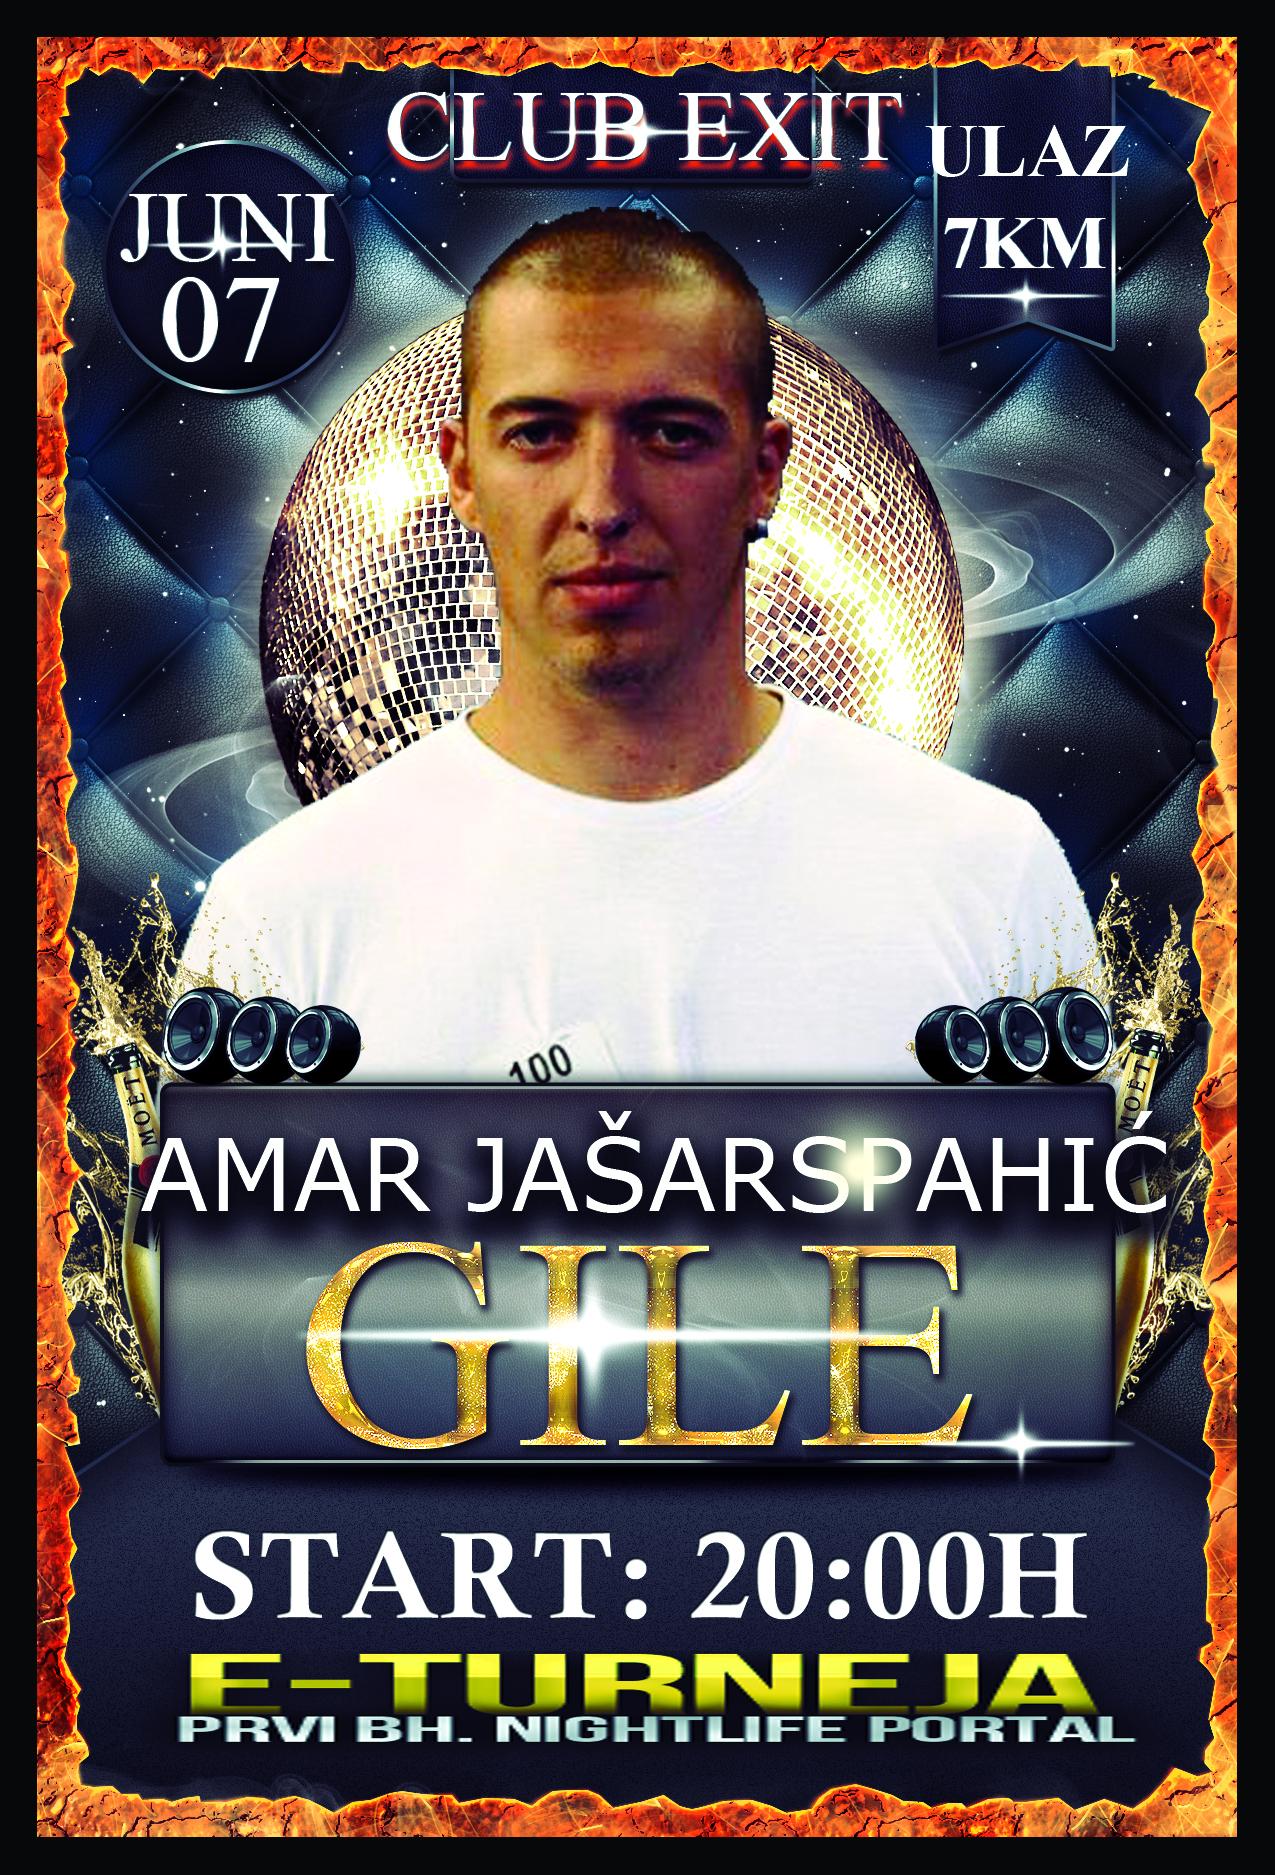 Amar Jašarspahić @ Club Exit (07.06)